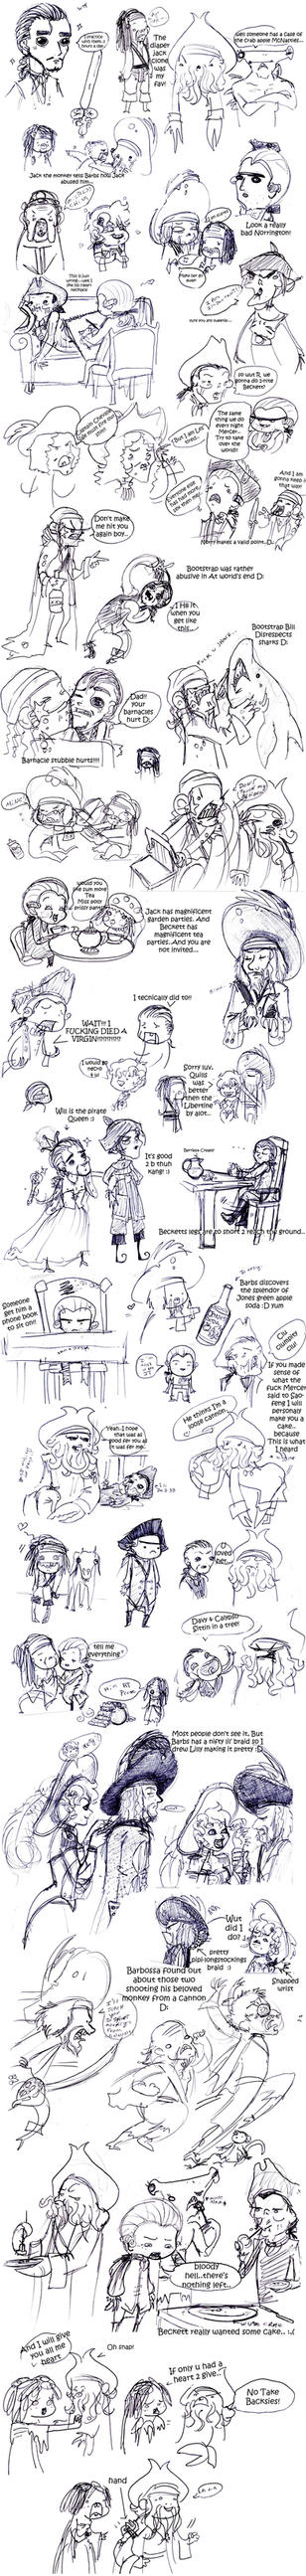 POTC: AWE sketch dump 4 by OhSadface